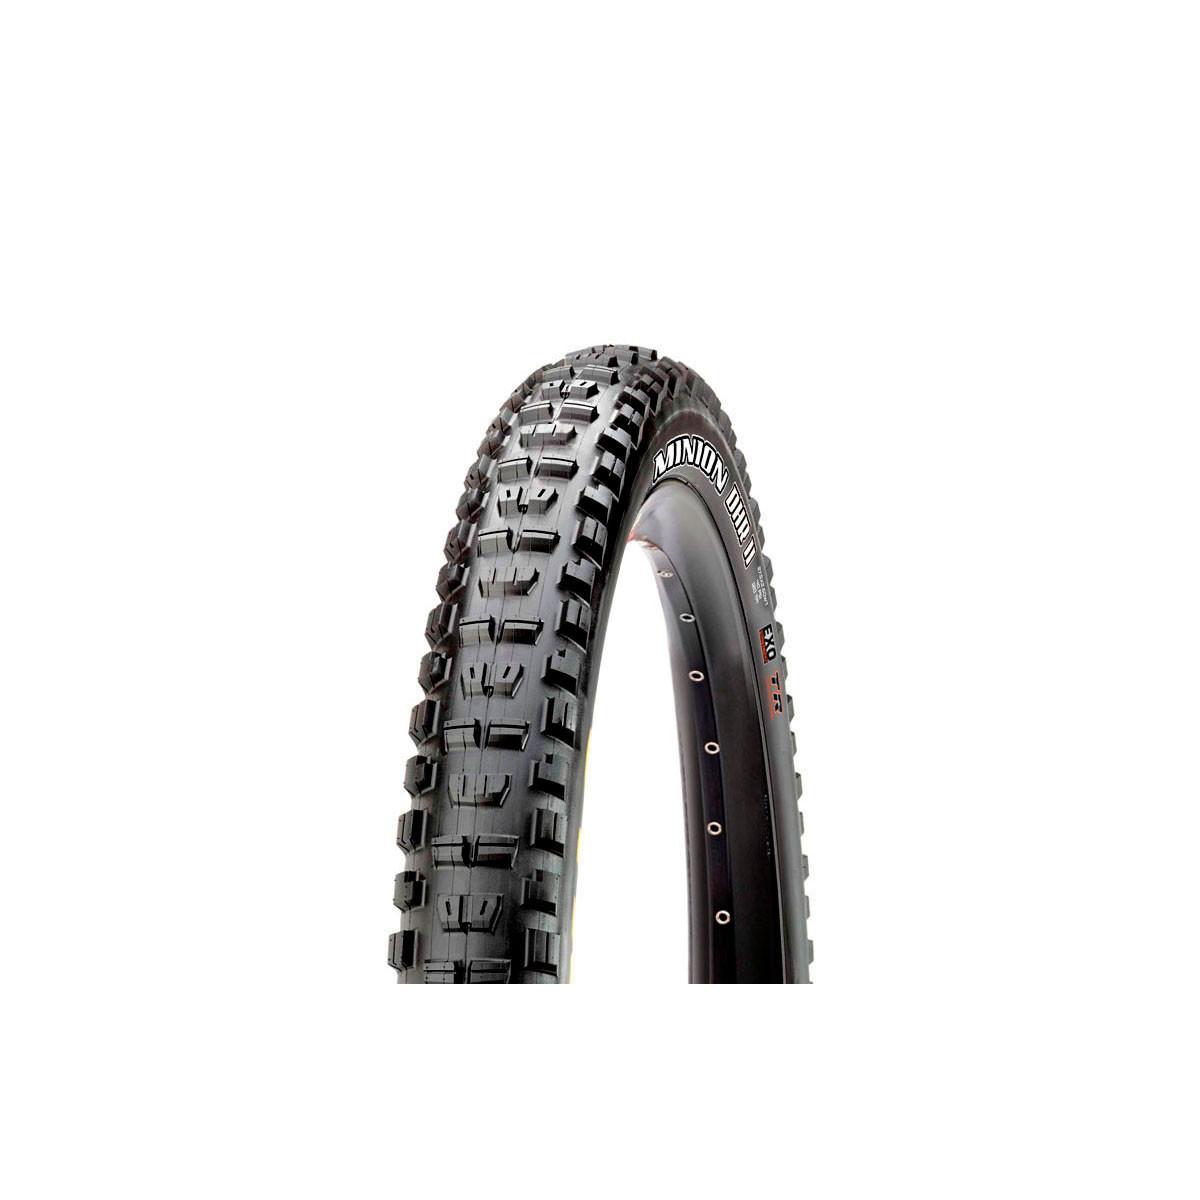 "Minion DHF Tire, 29 x 2.6"" DC/EXO/TR/WT-1"